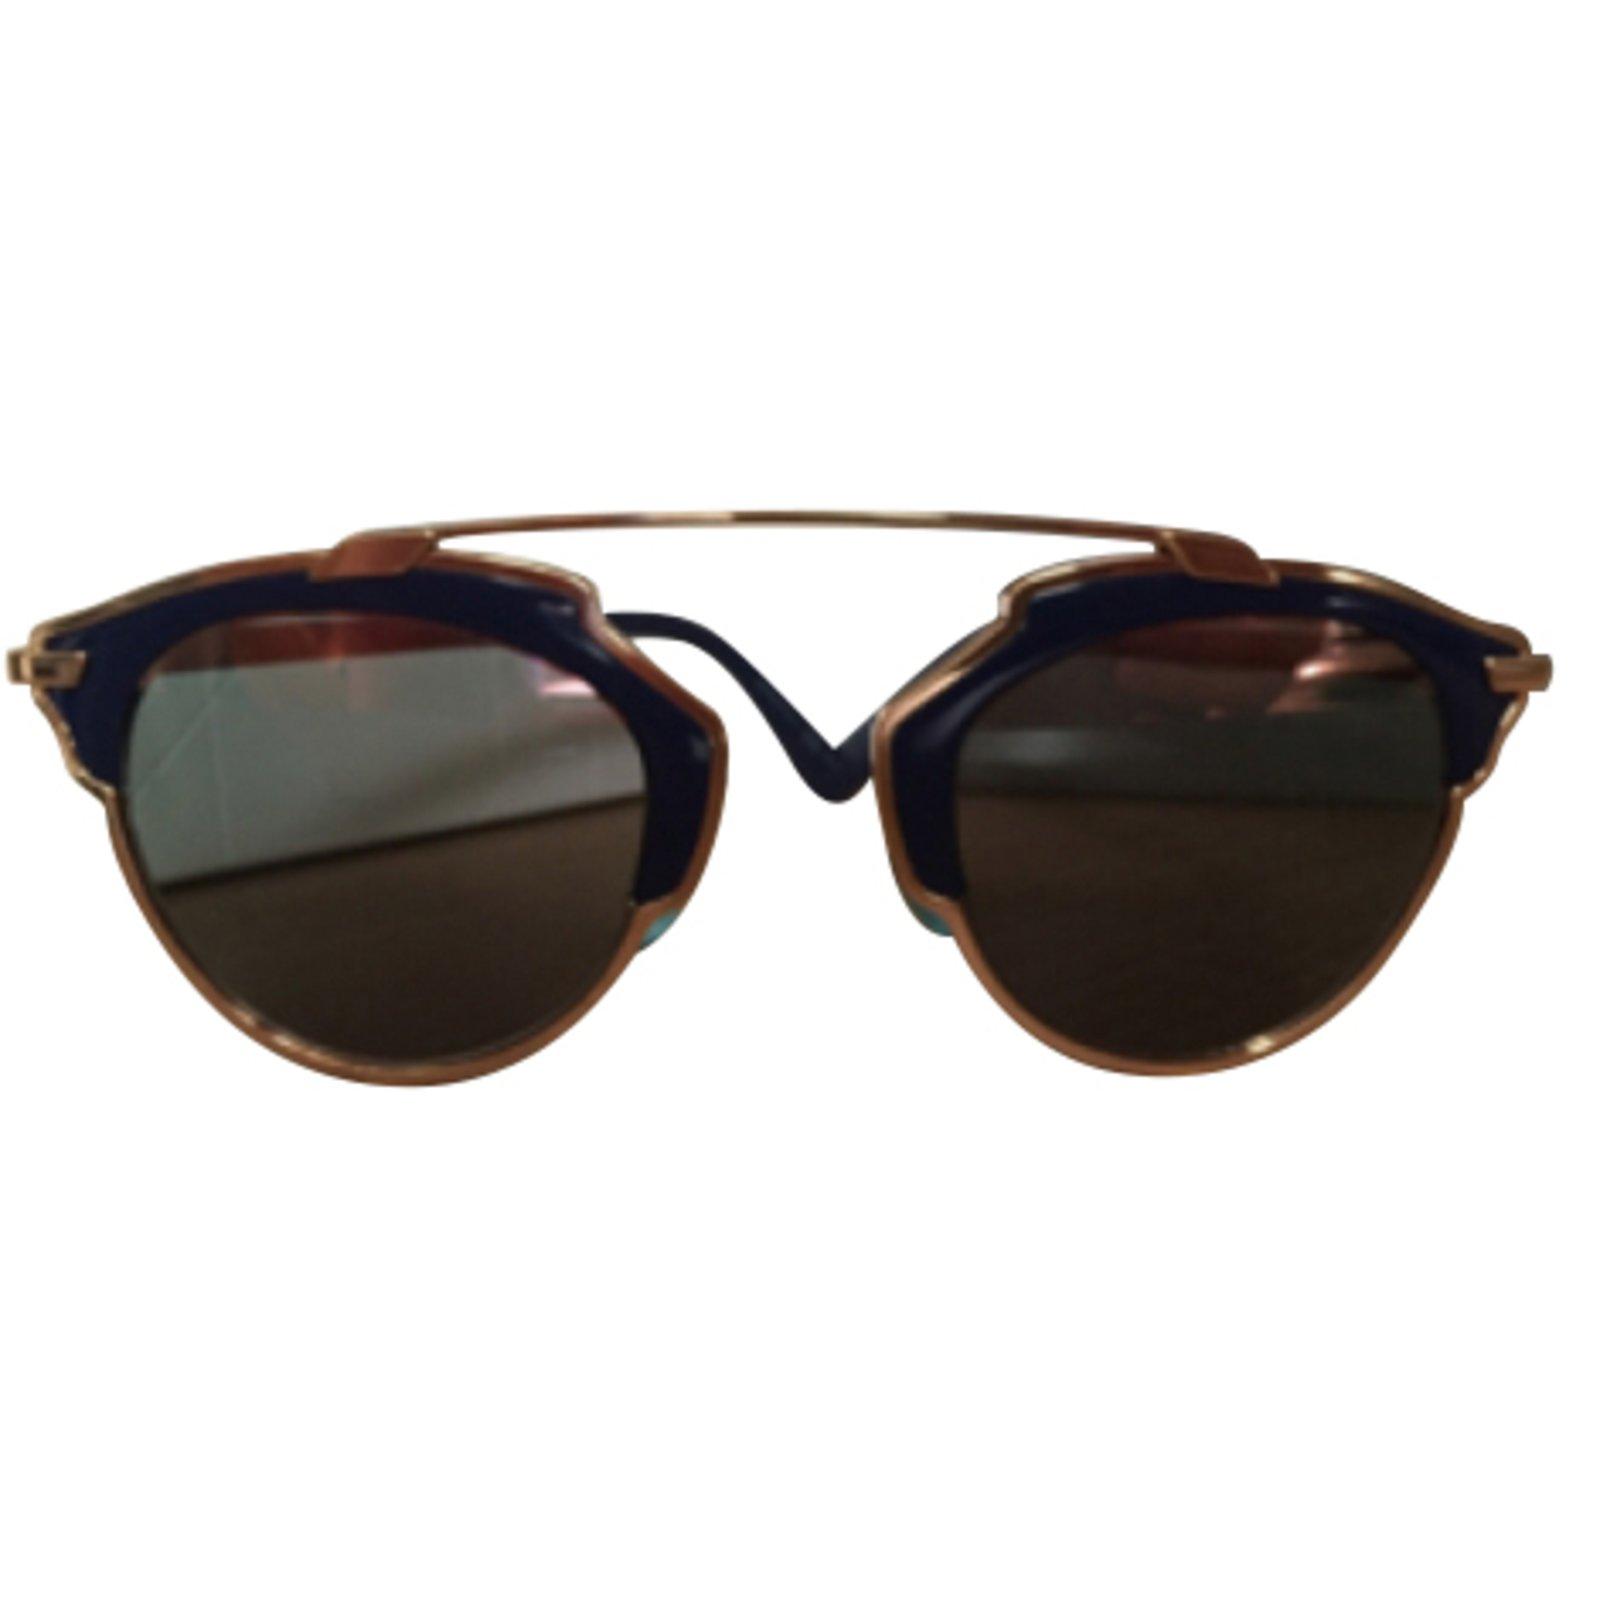 b1068df9c949 Christian Dior Sunglasses Sunglasses Steel Blue ref.7955 - Joli Closet